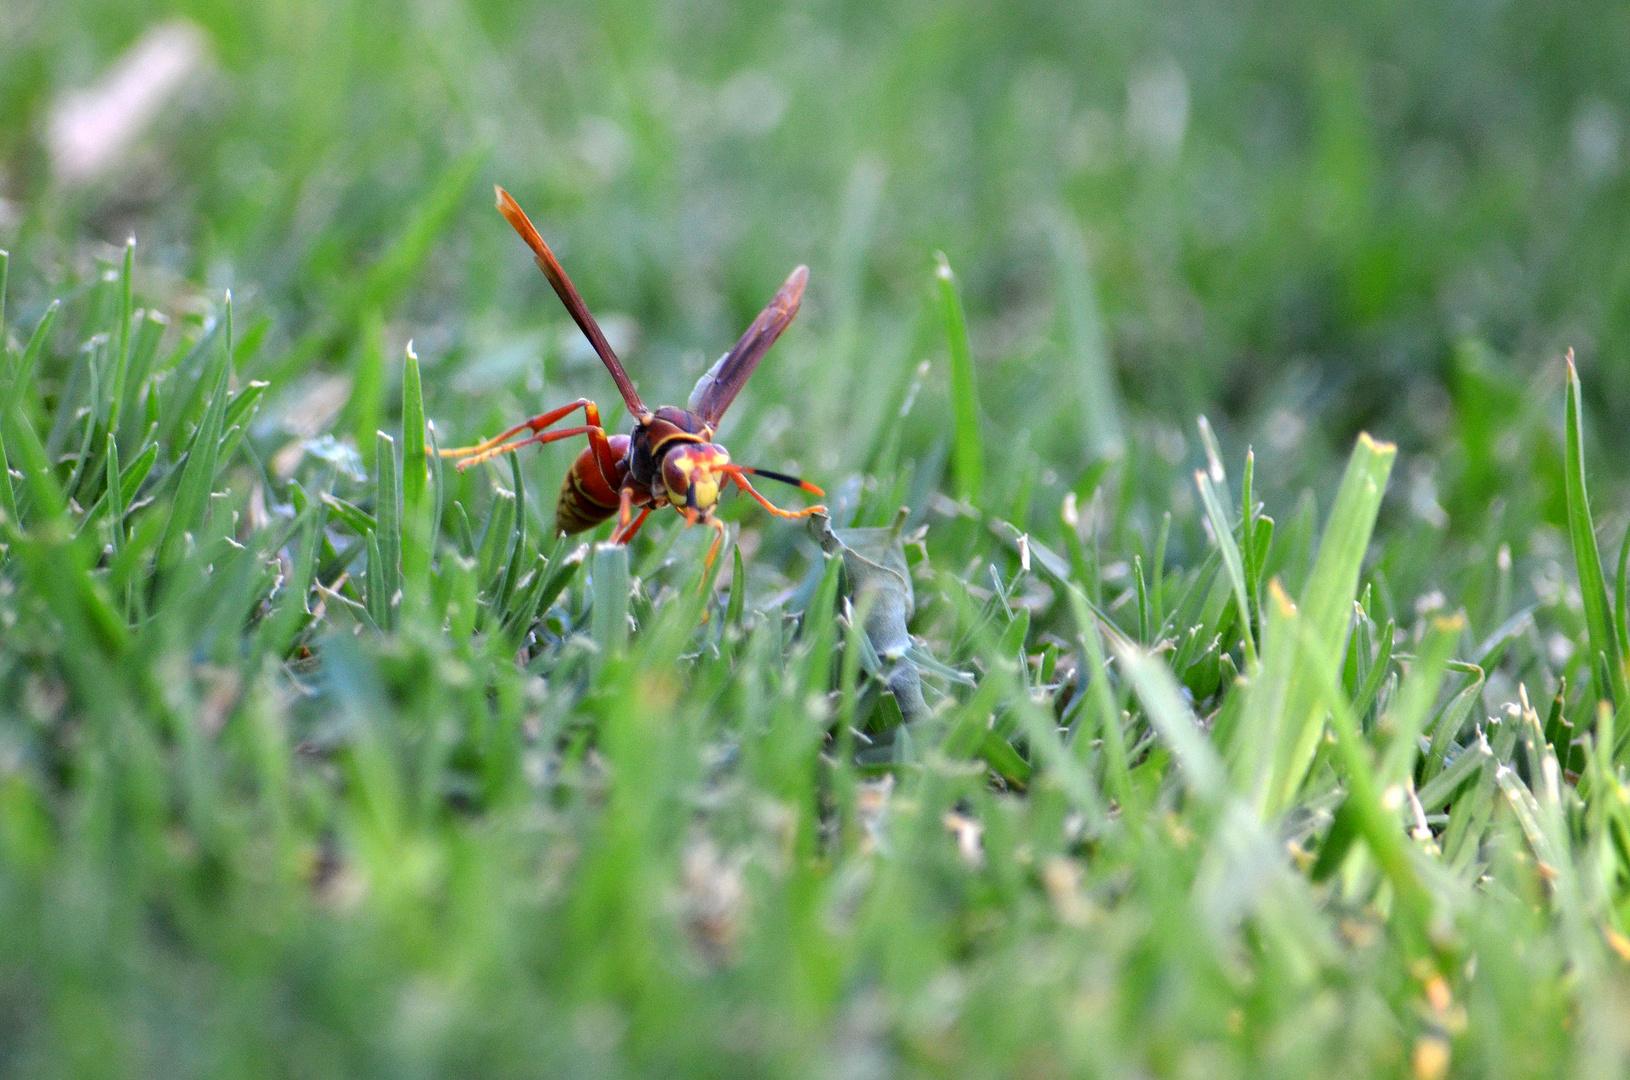 Insectos himenópteros alados con aguijón.